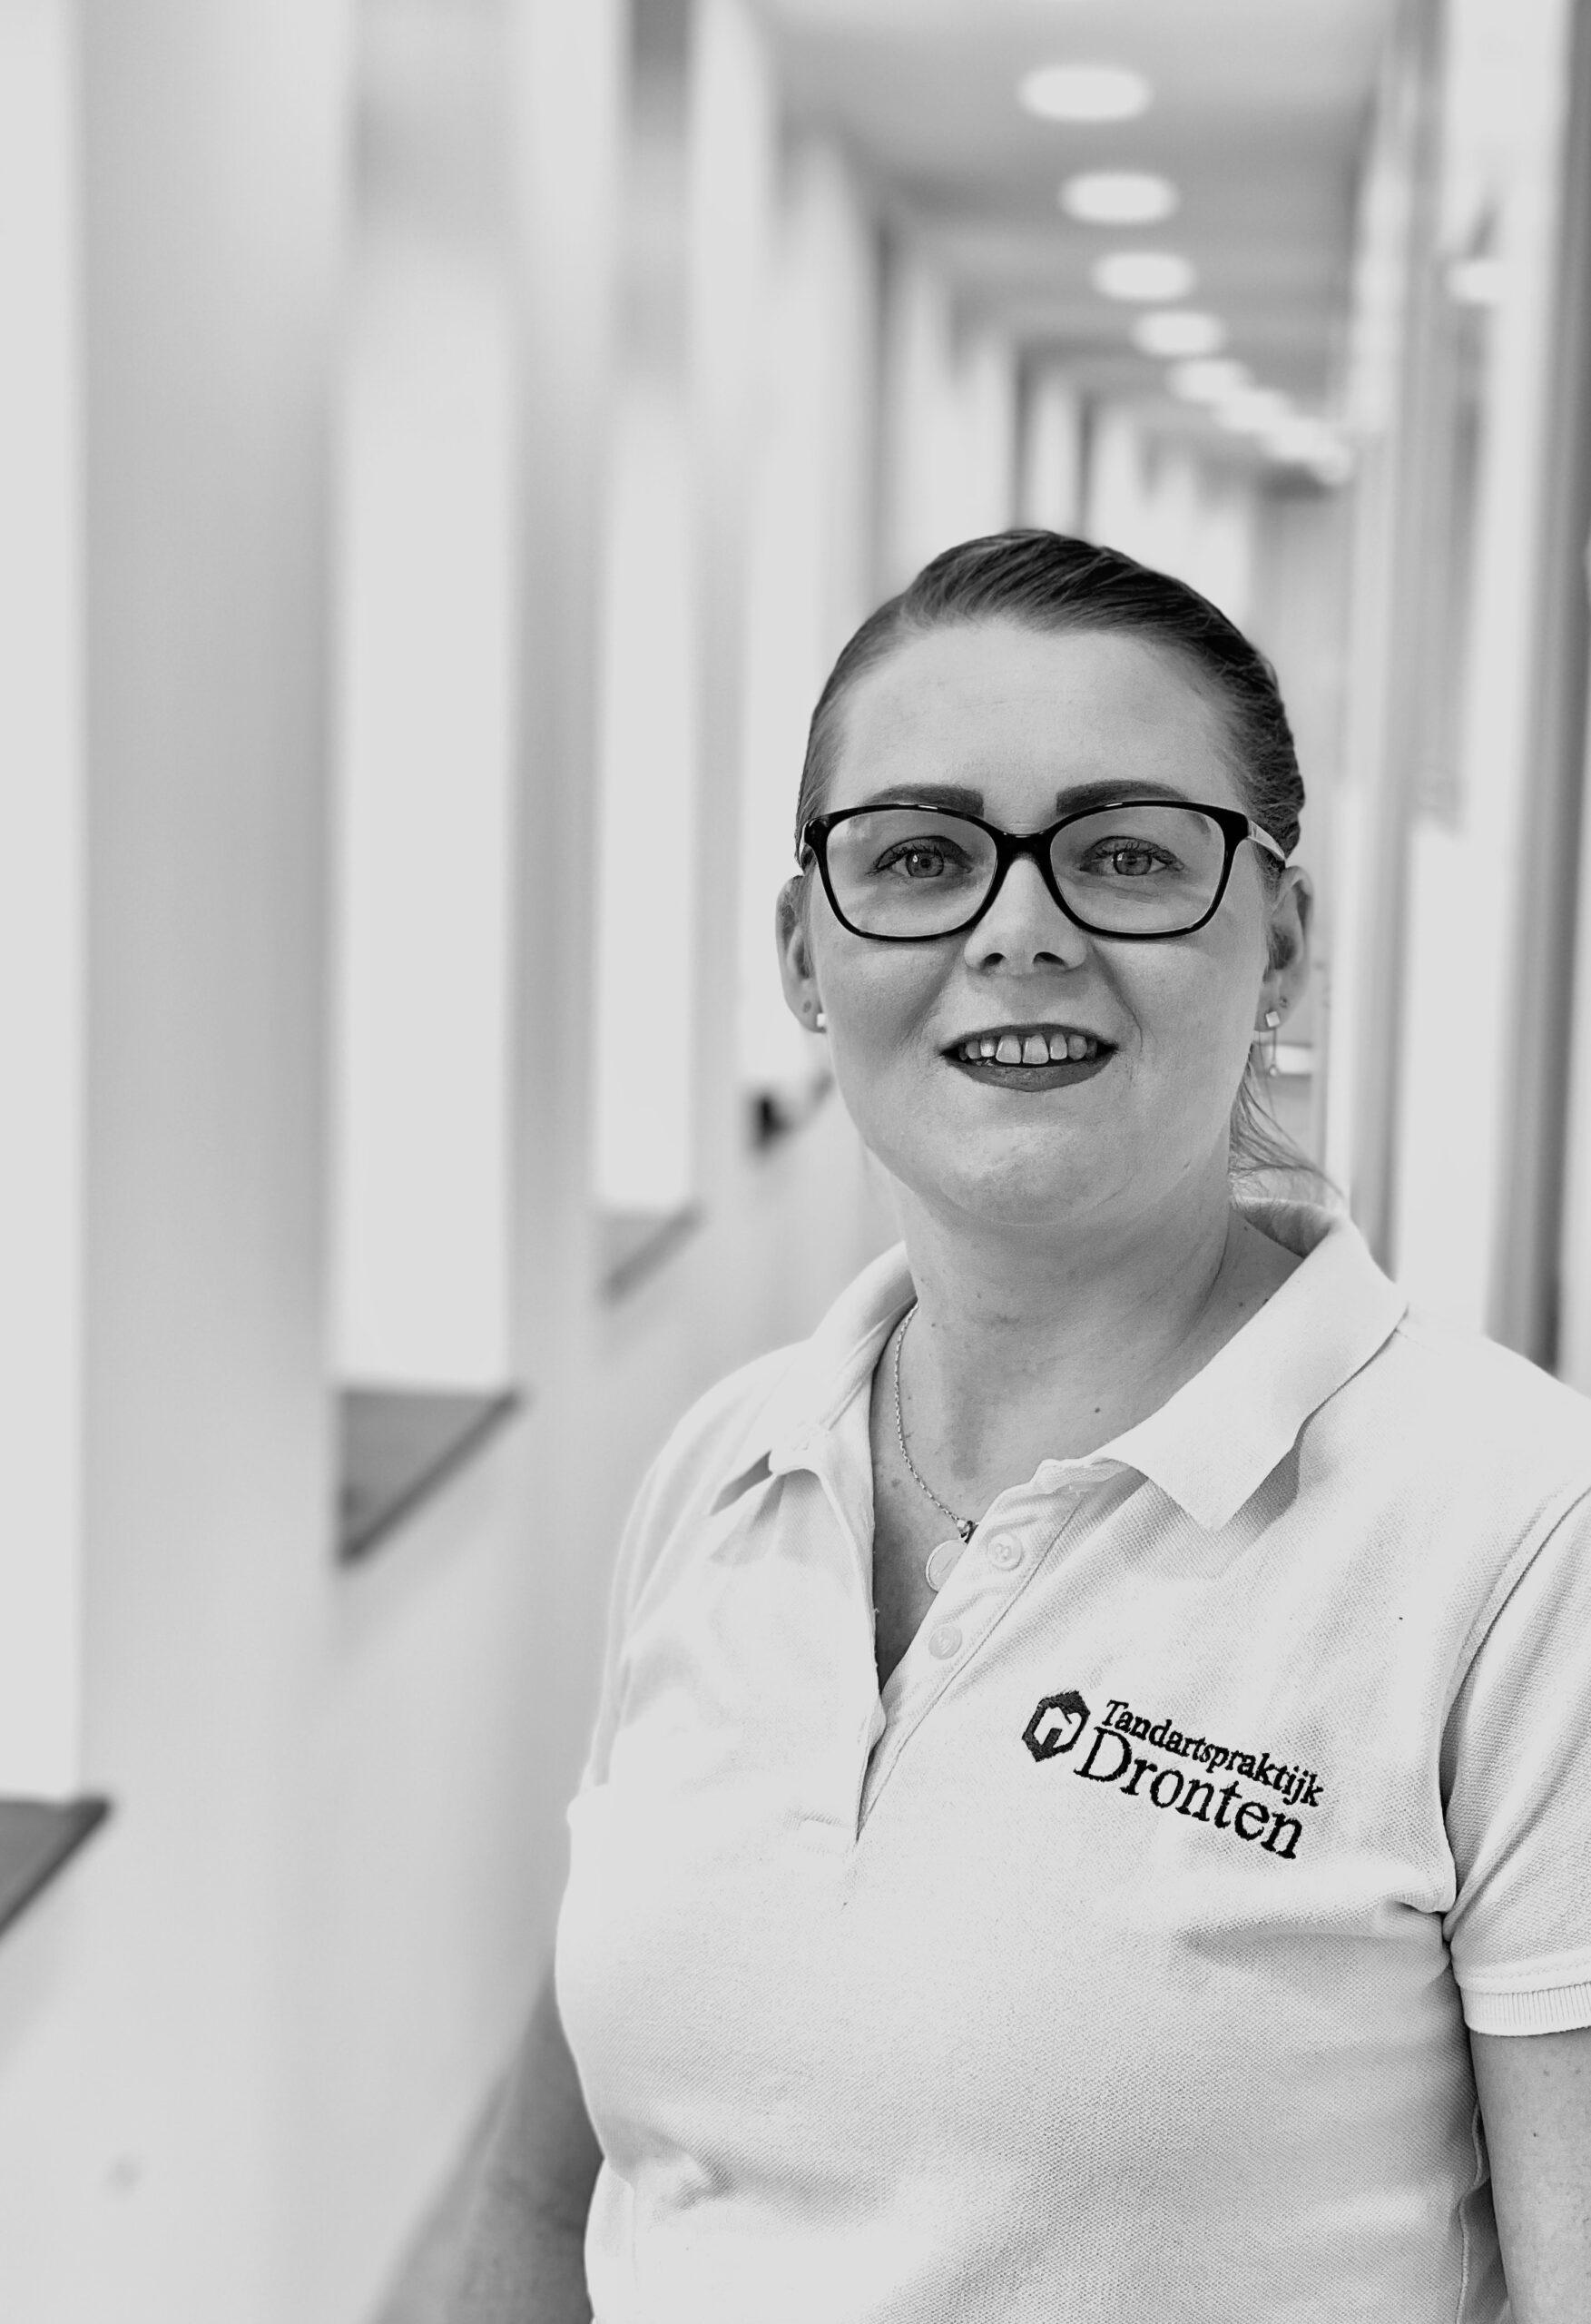 Sharon Veen tandartsassistent Dronten